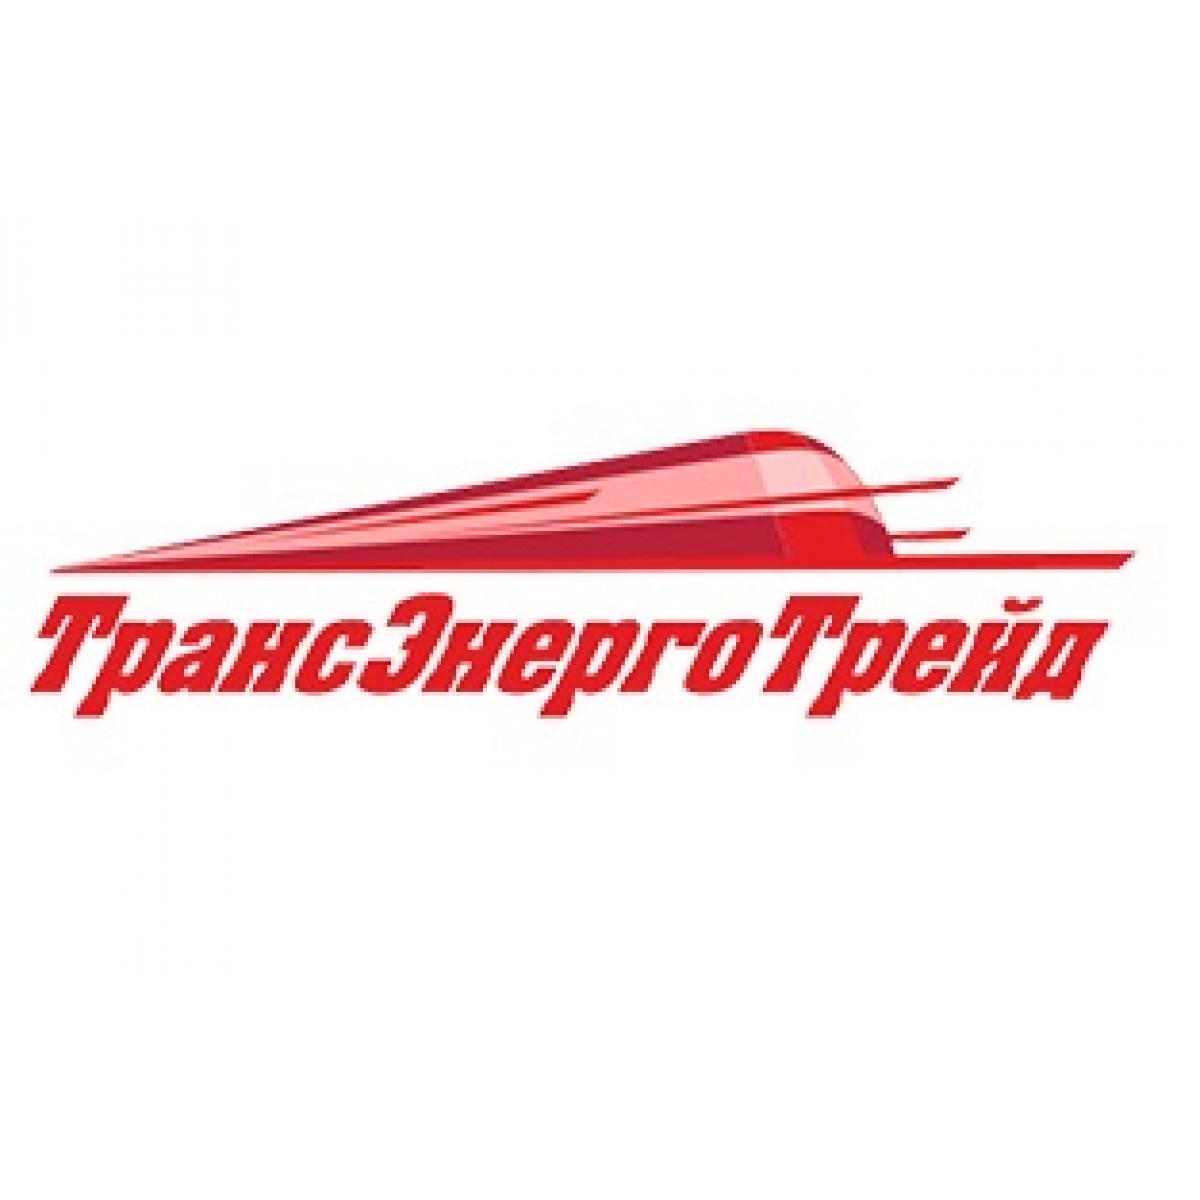 trans-logistik-sankt-peterburg